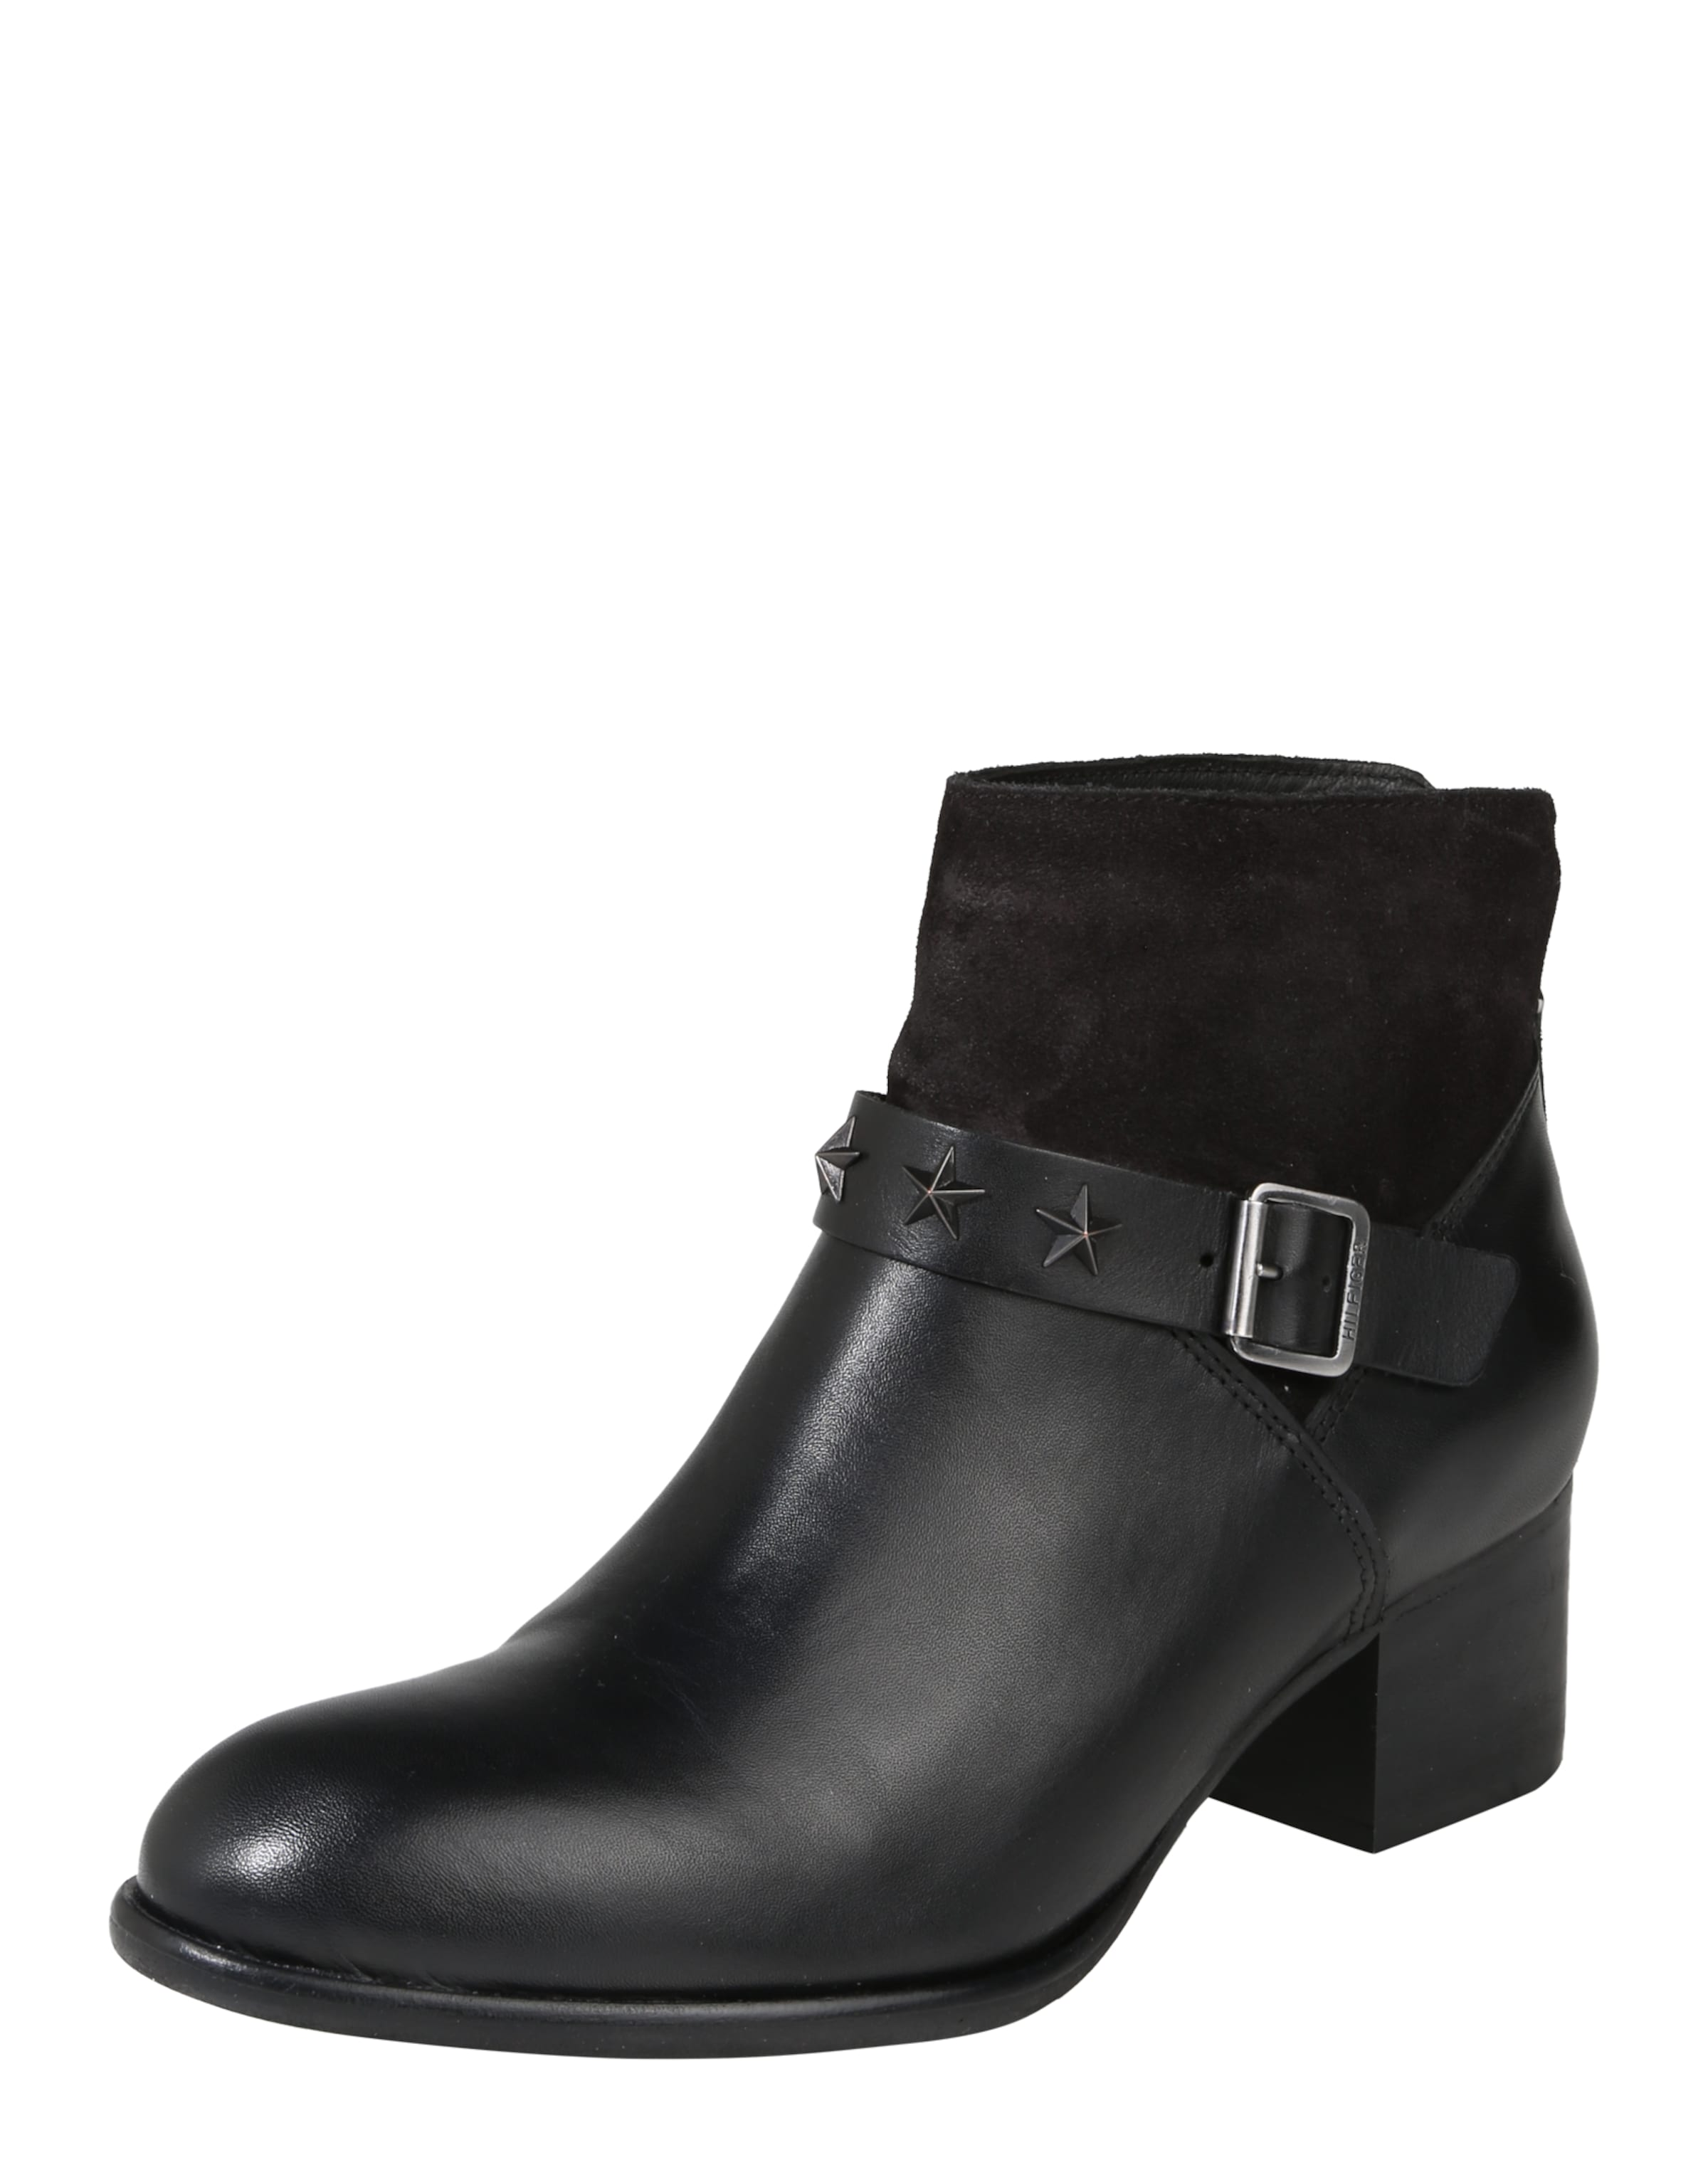 Haltbare Mode billige Schuhe TOMMY HILFIGER | Leder Stiefelette Schuhe Gut getragene Schuhe